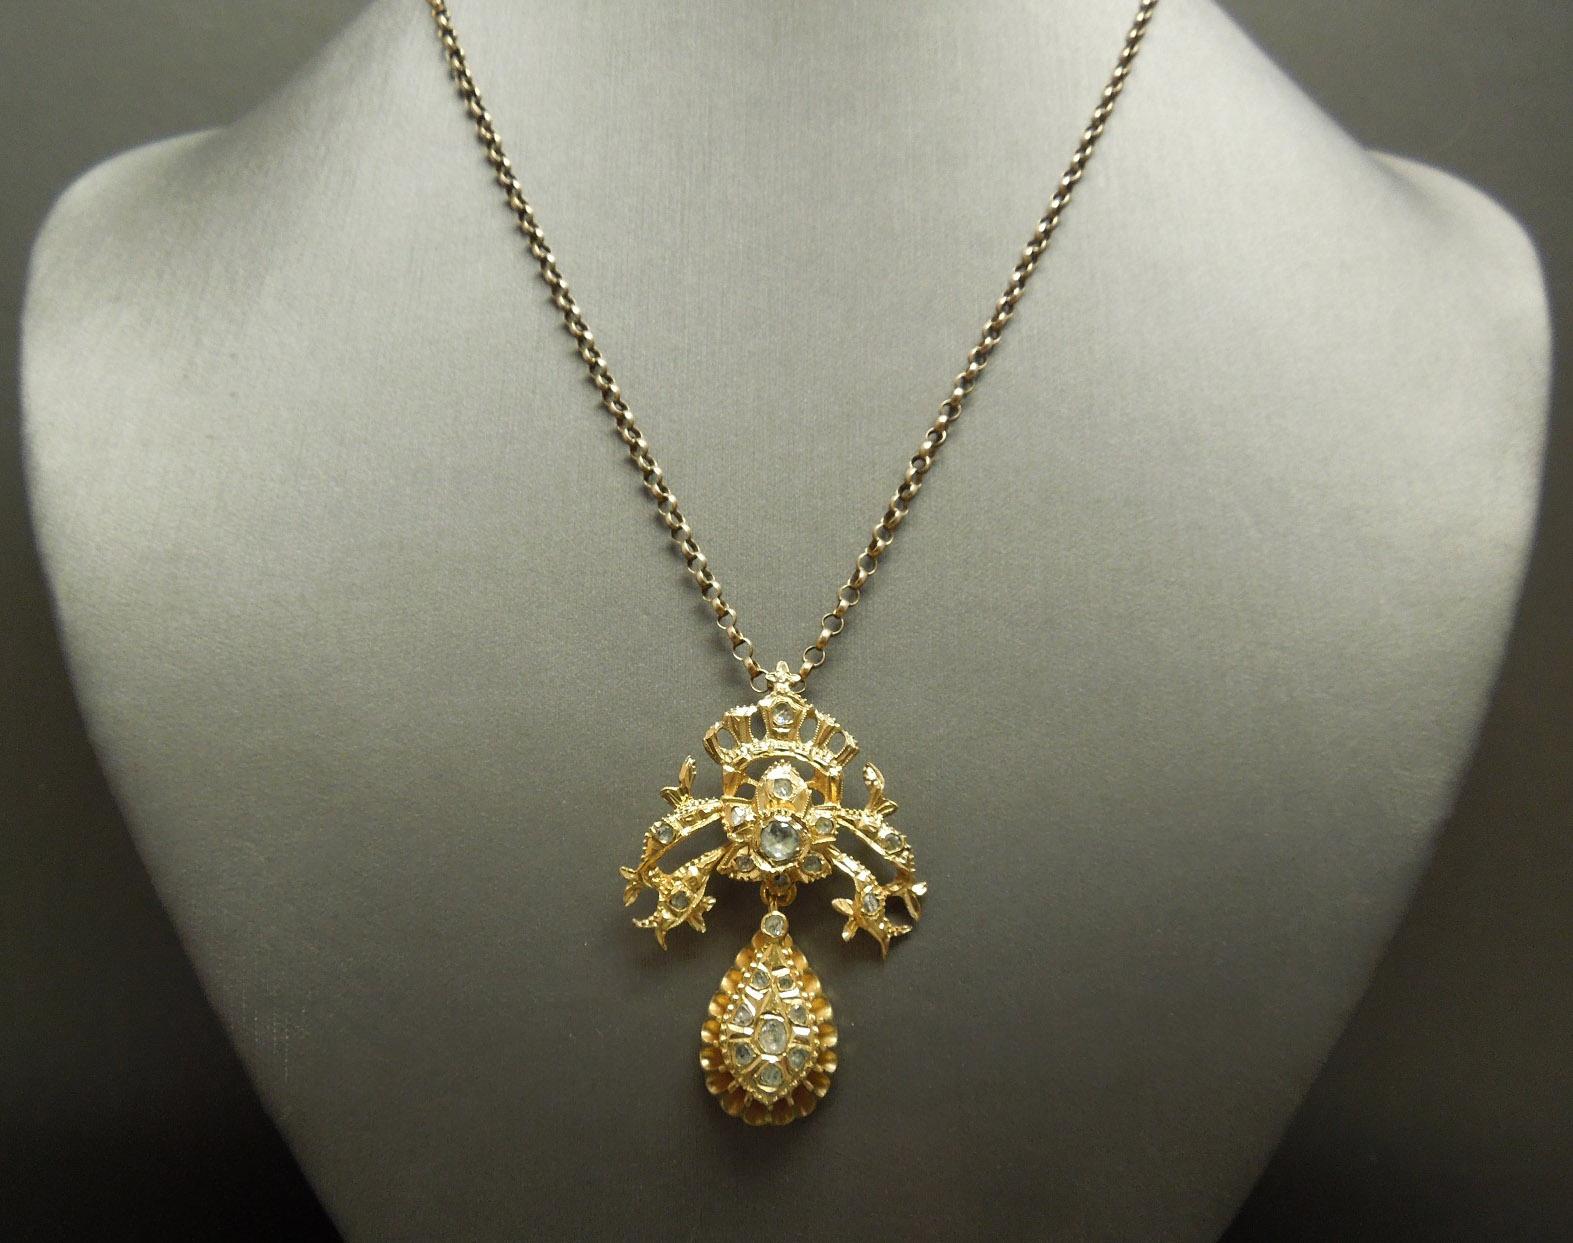 24k 2 50tcw Rose Cut Diamond Antique Russian Jewelry Set C1900